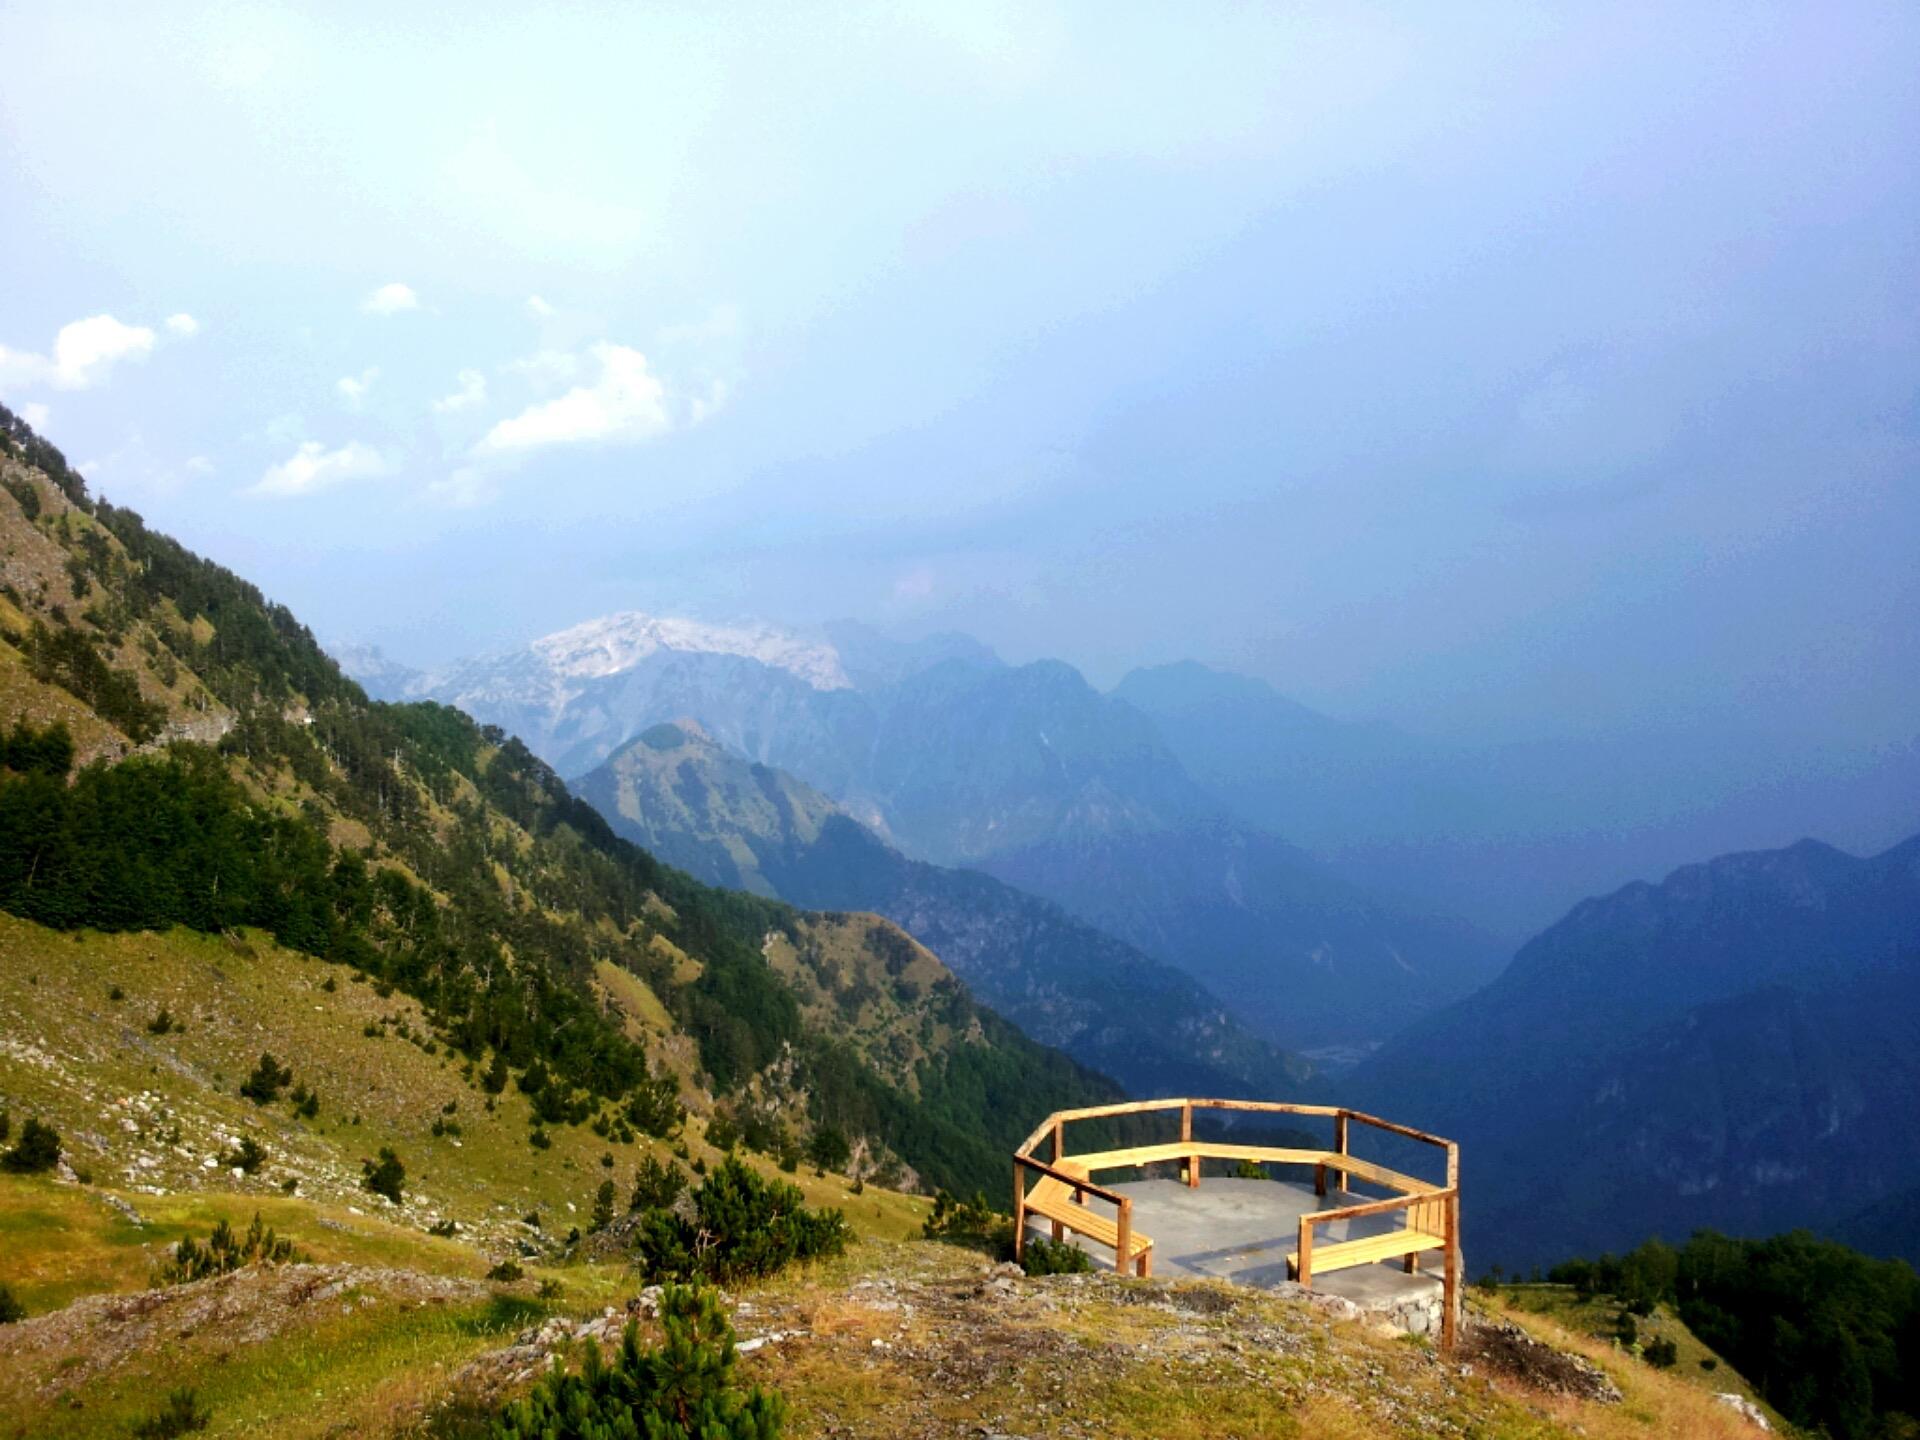 boge albanian alps views